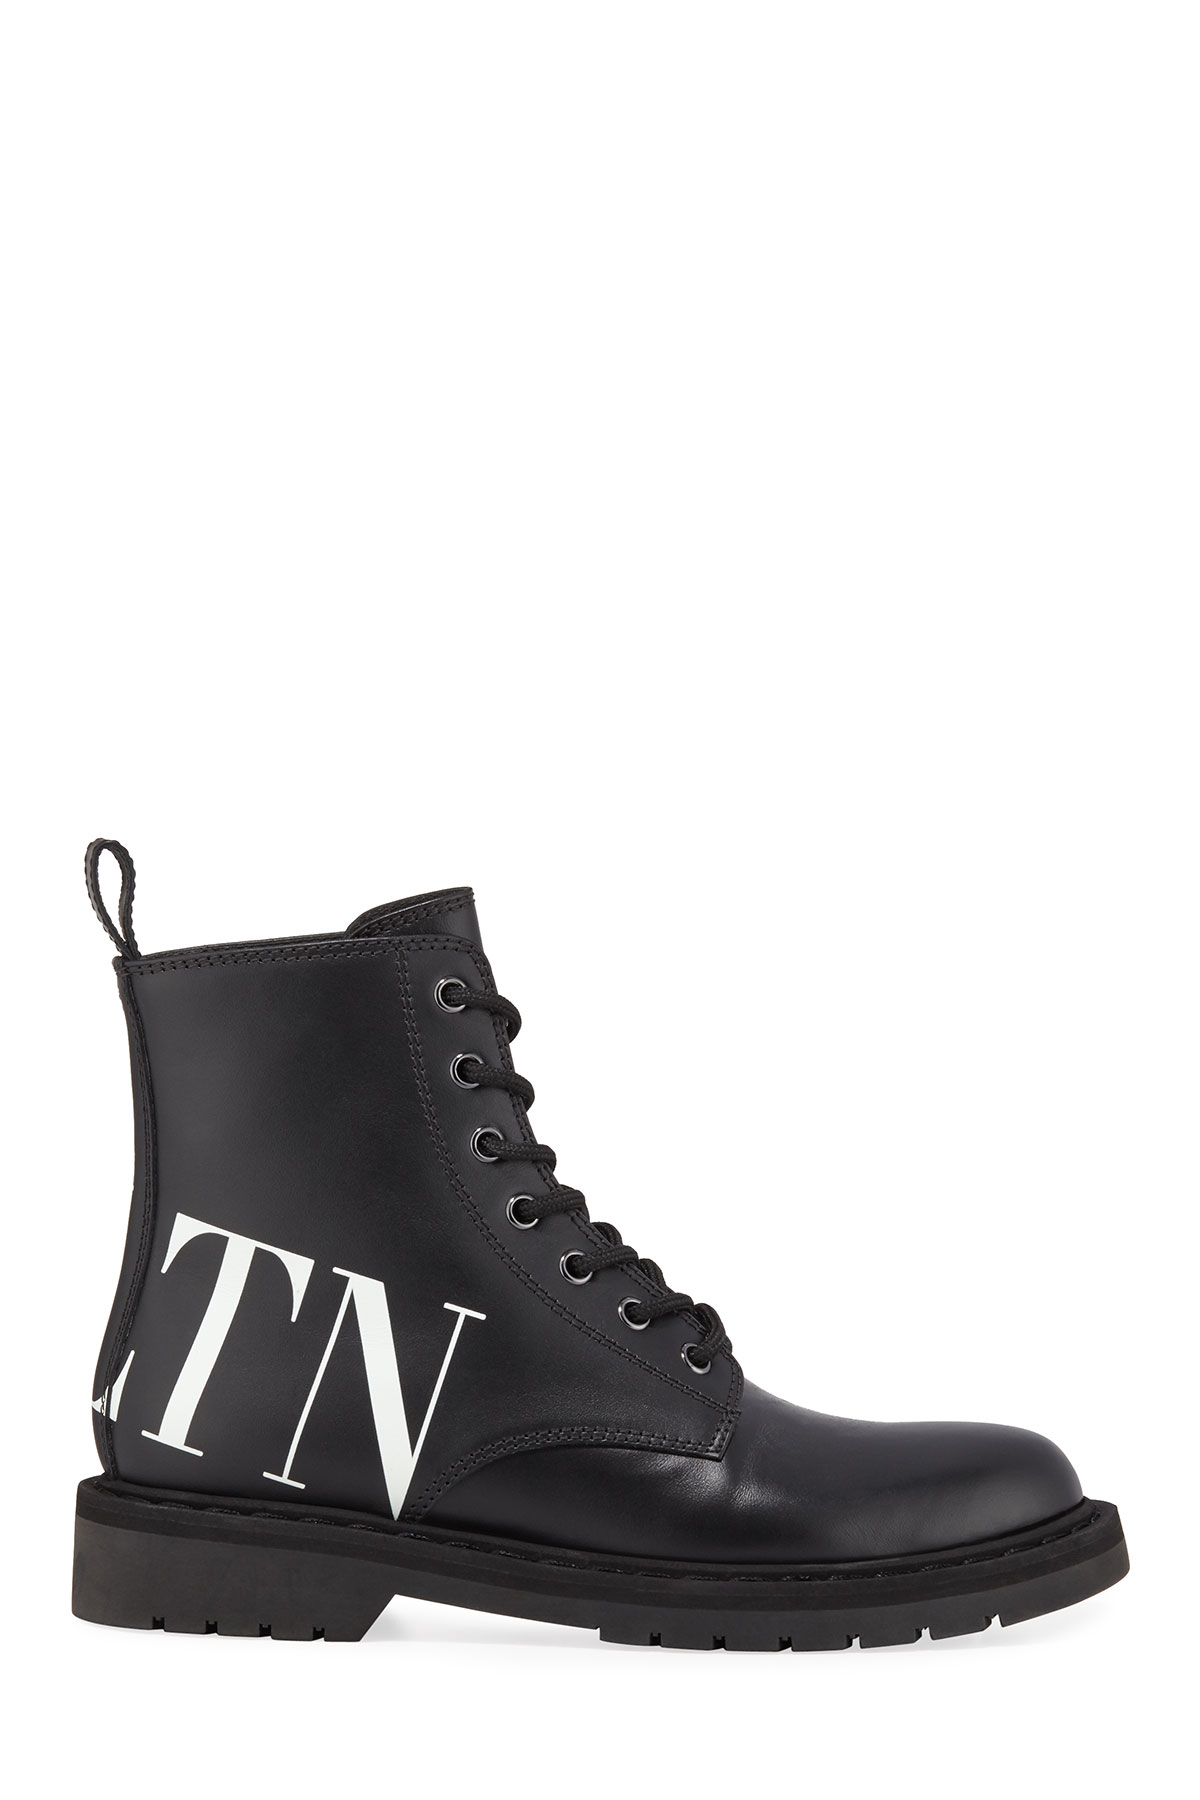 0217742c6476b2 Valentino Garavani VLTN Leather Combat Boots